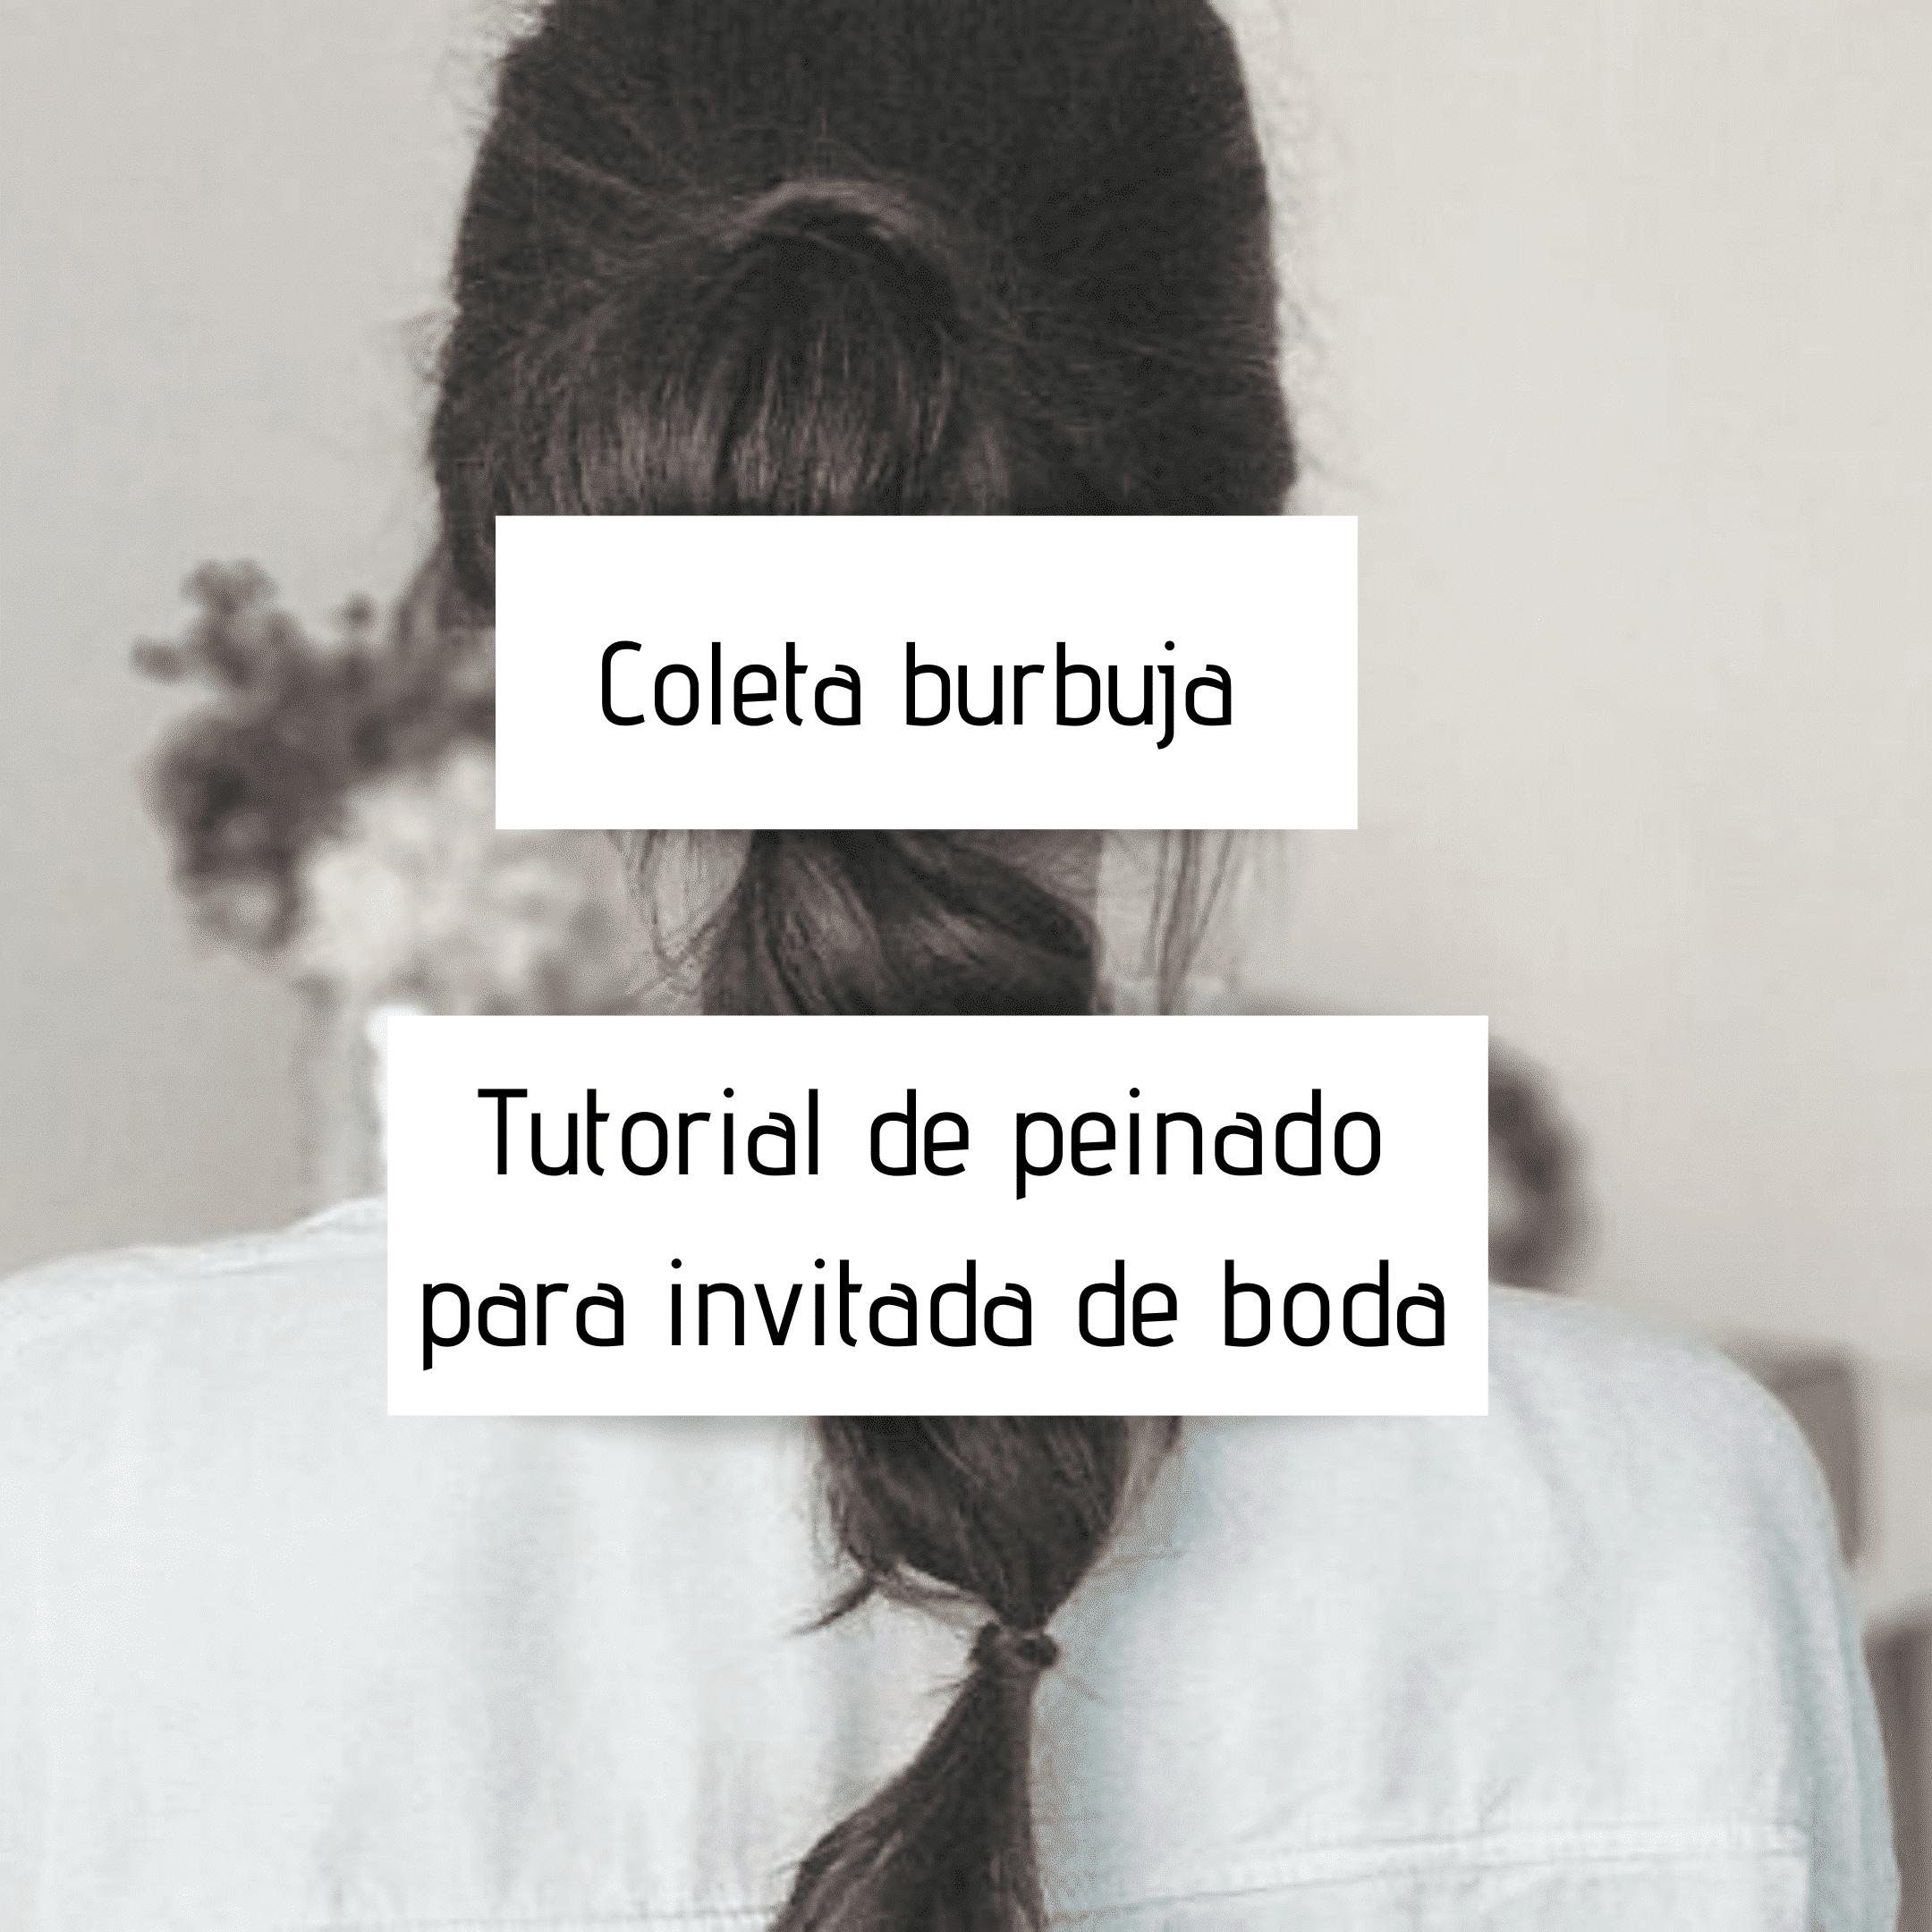 Coleta burbuja – Tutorial de peinado para invitada de boda